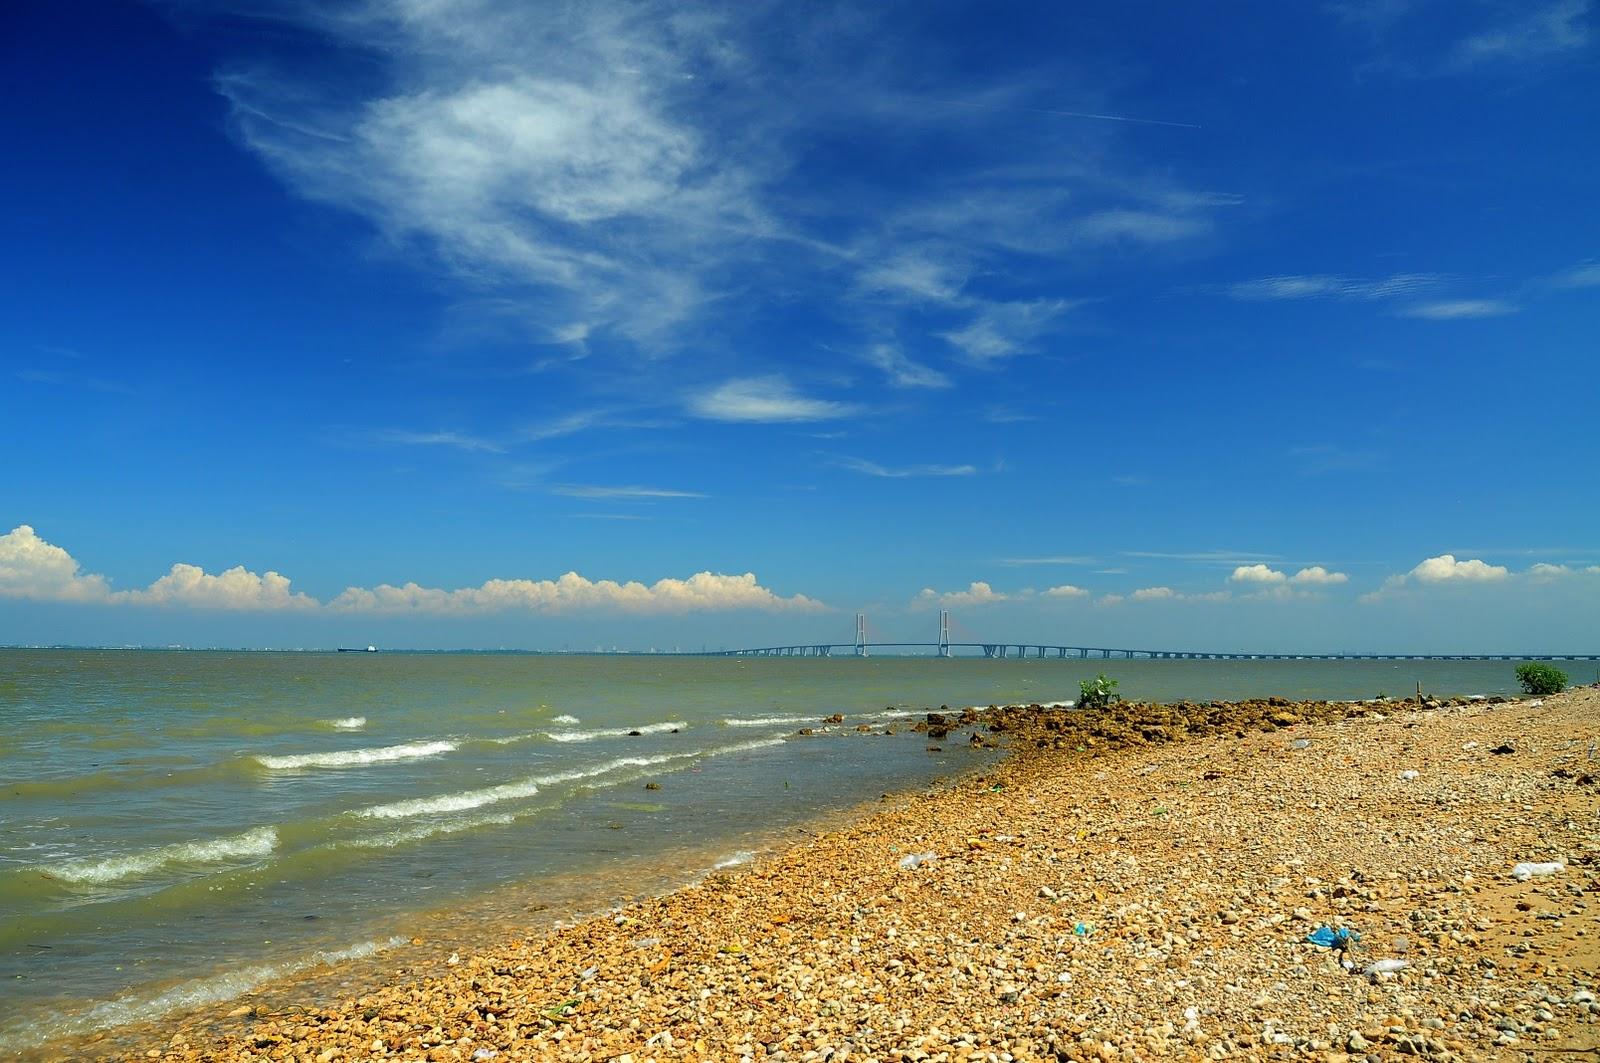 Wisata Pantai Rongkang Bangkalan Cocok Liburan Daily Terletak Ujung Barat